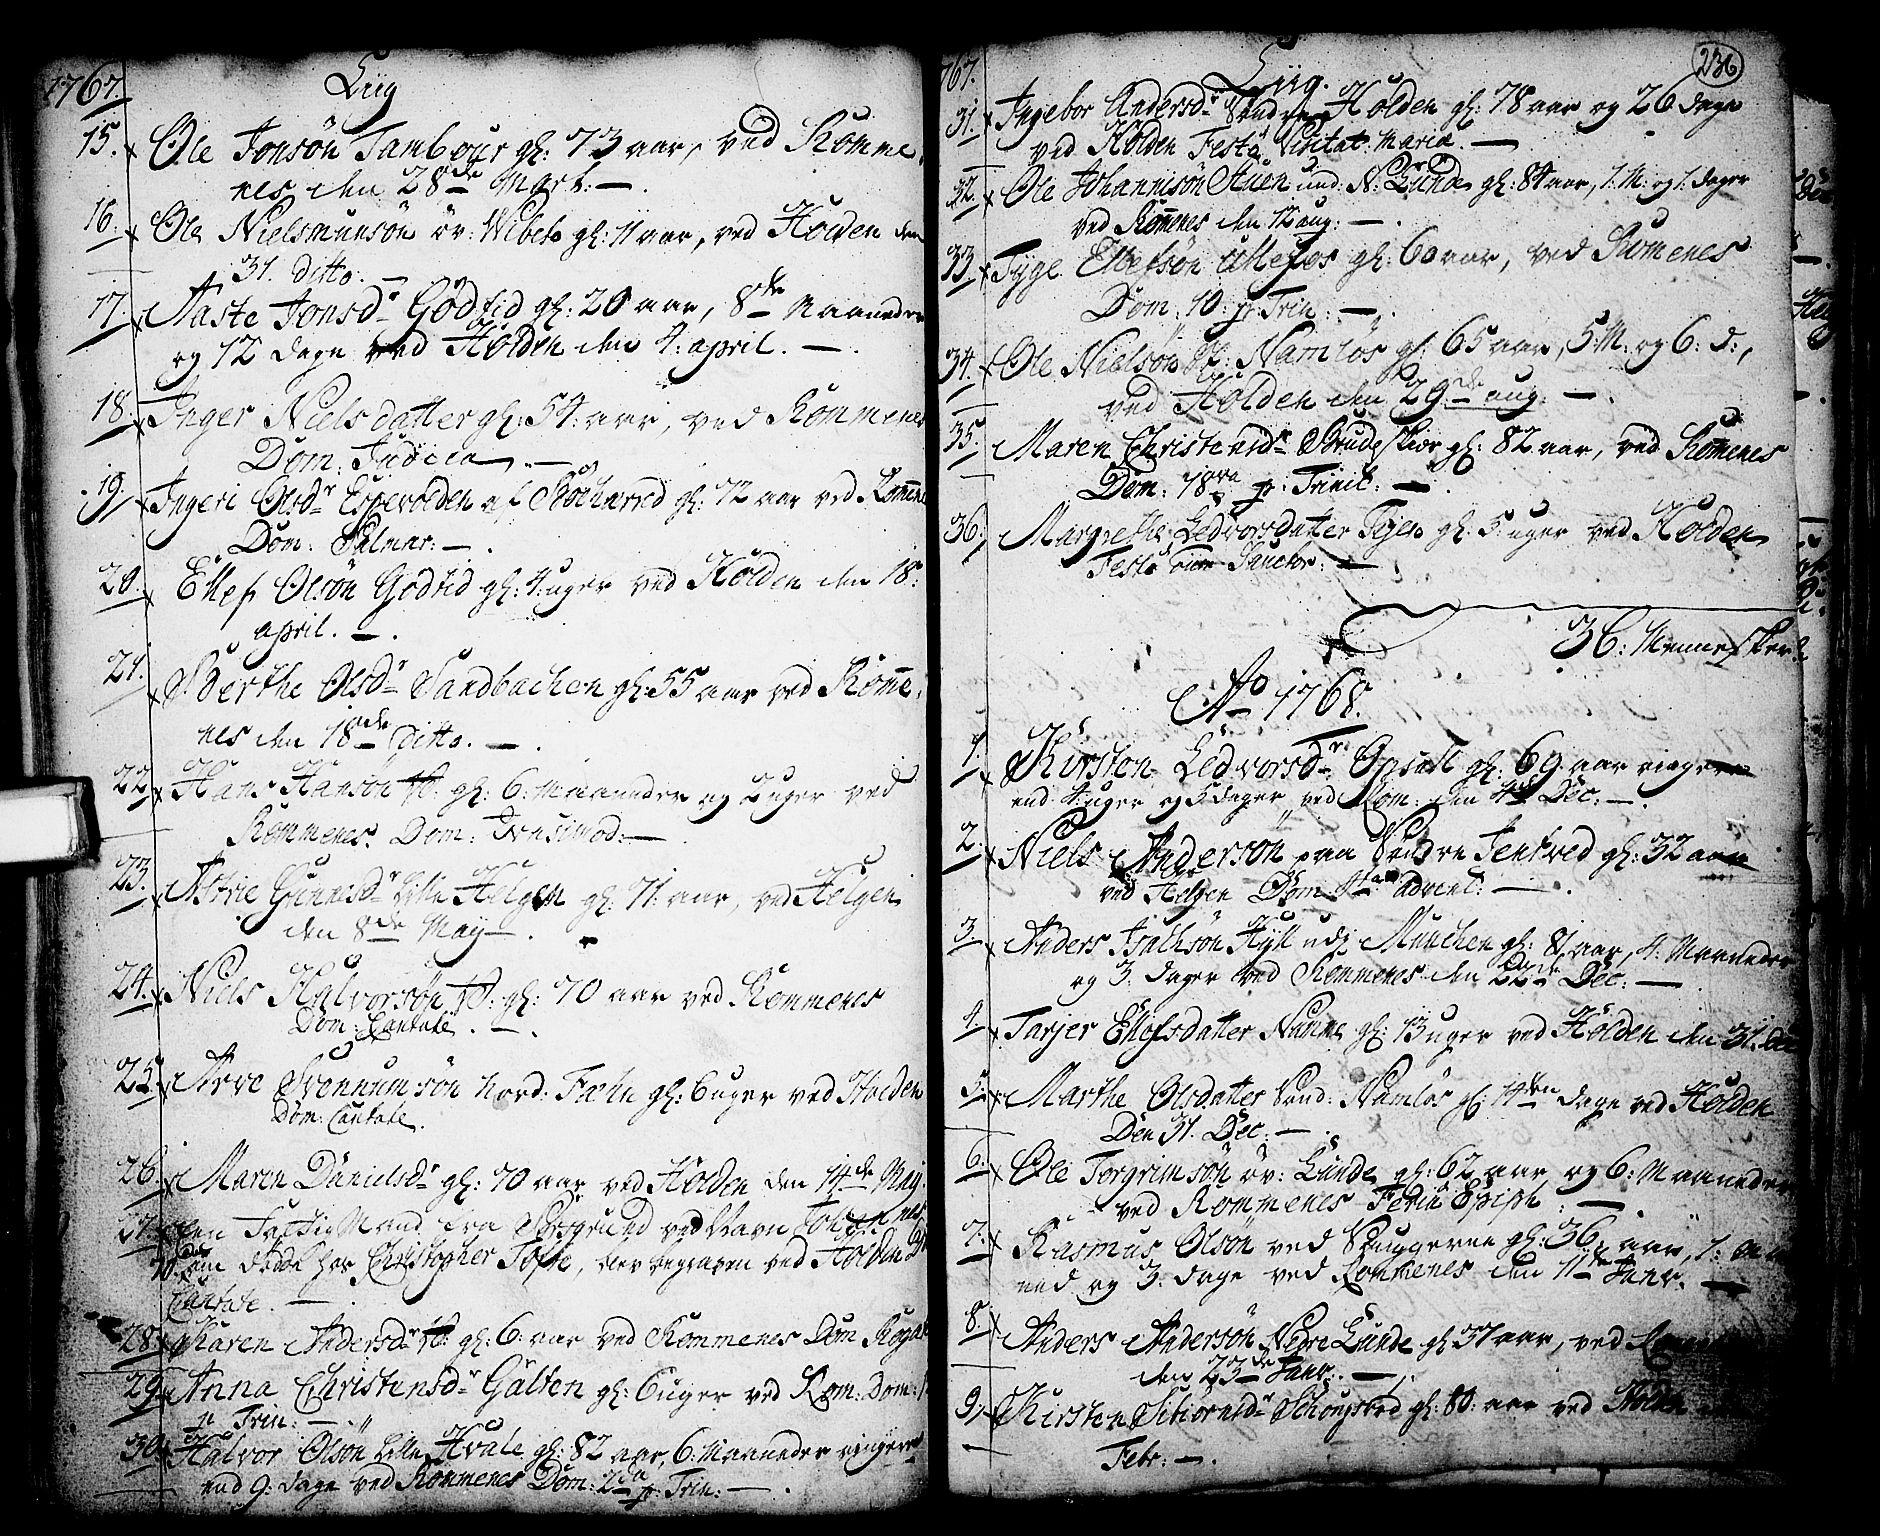 SAKO, Holla kirkebøker, F/Fa/L0001: Ministerialbok nr. 1, 1717-1779, s. 236